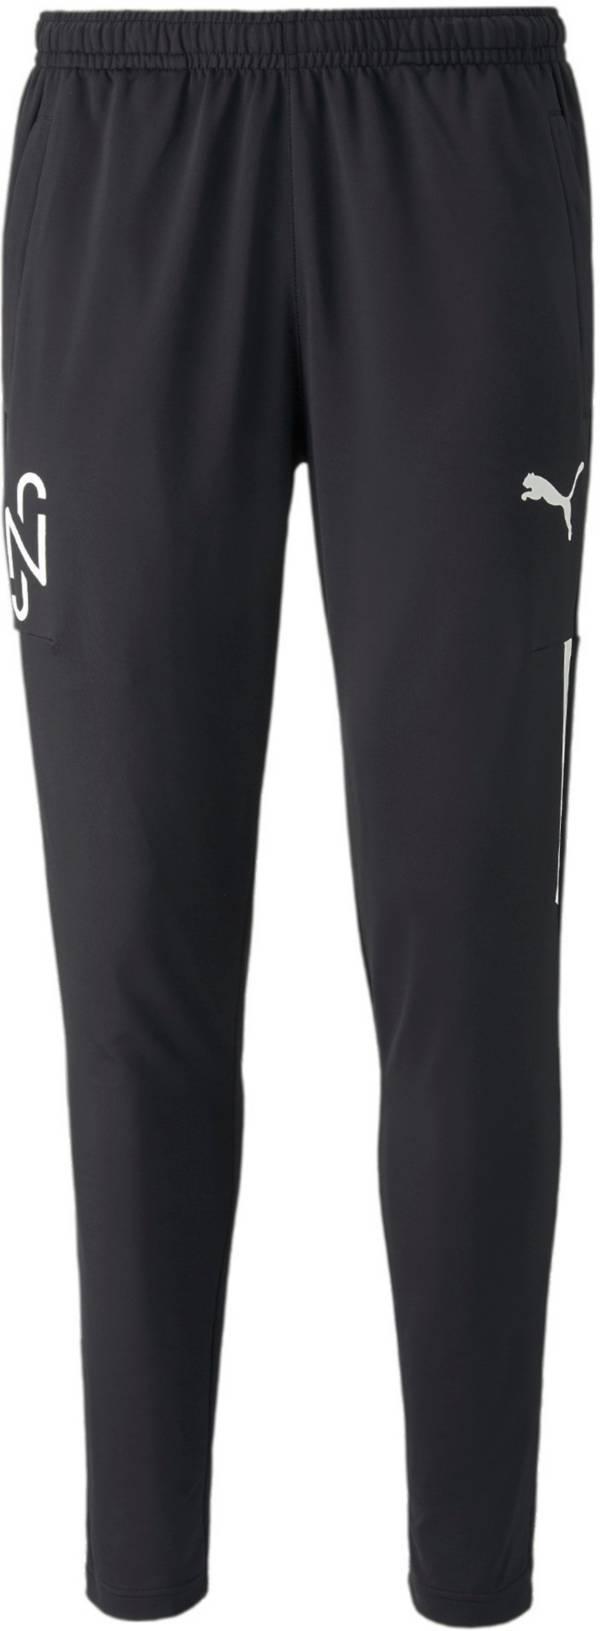 PUMA Men's Neymar Jr Copa Training Pants product image